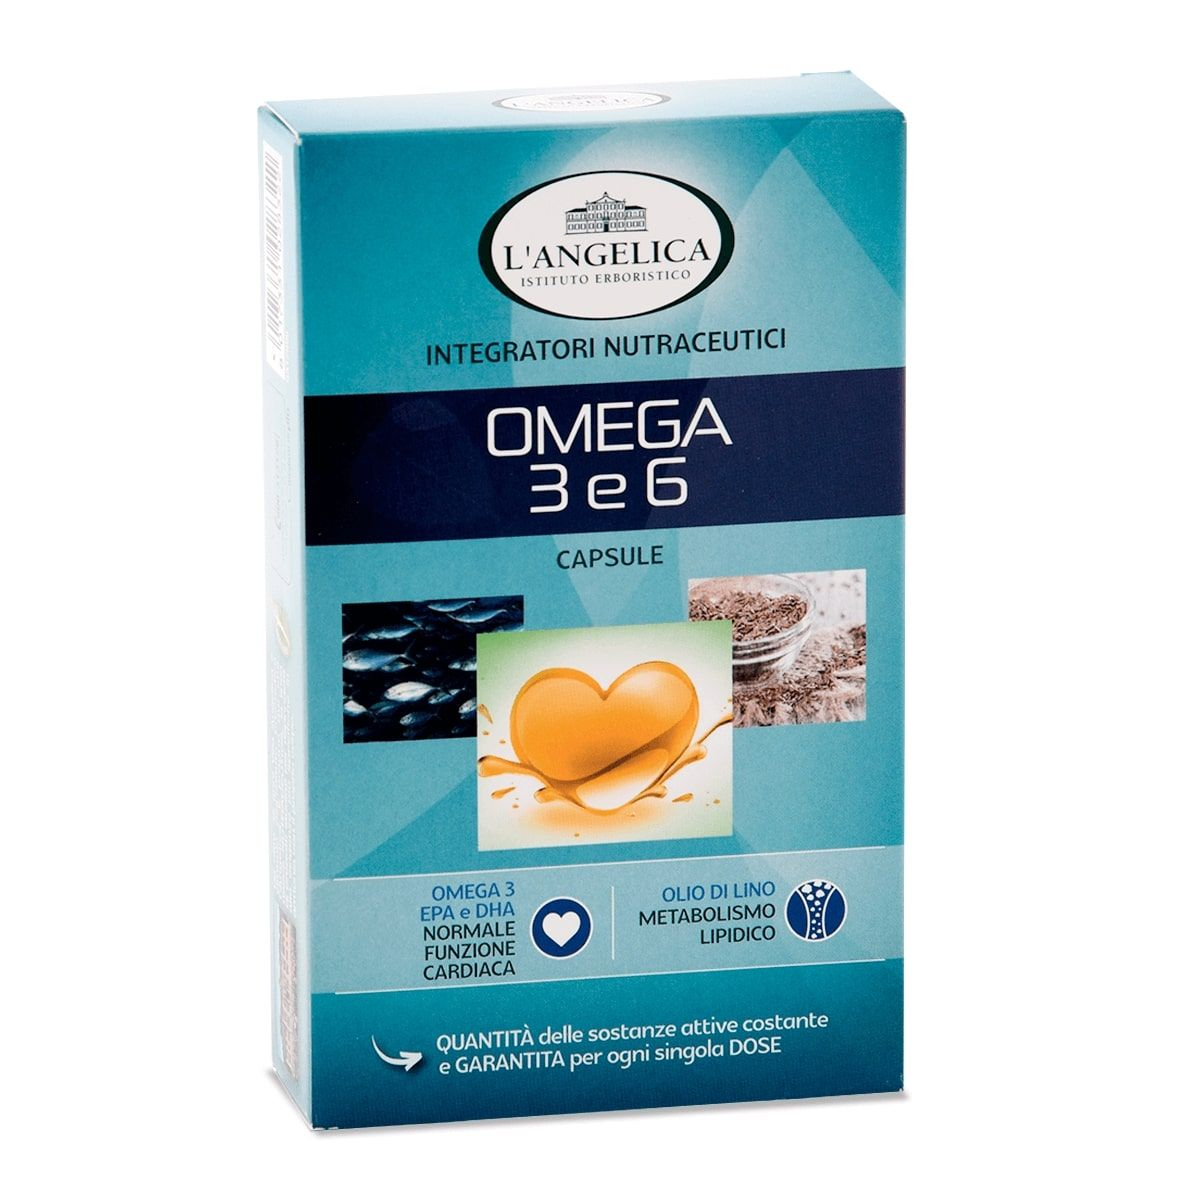 Omega 3 e 6 - Integratore